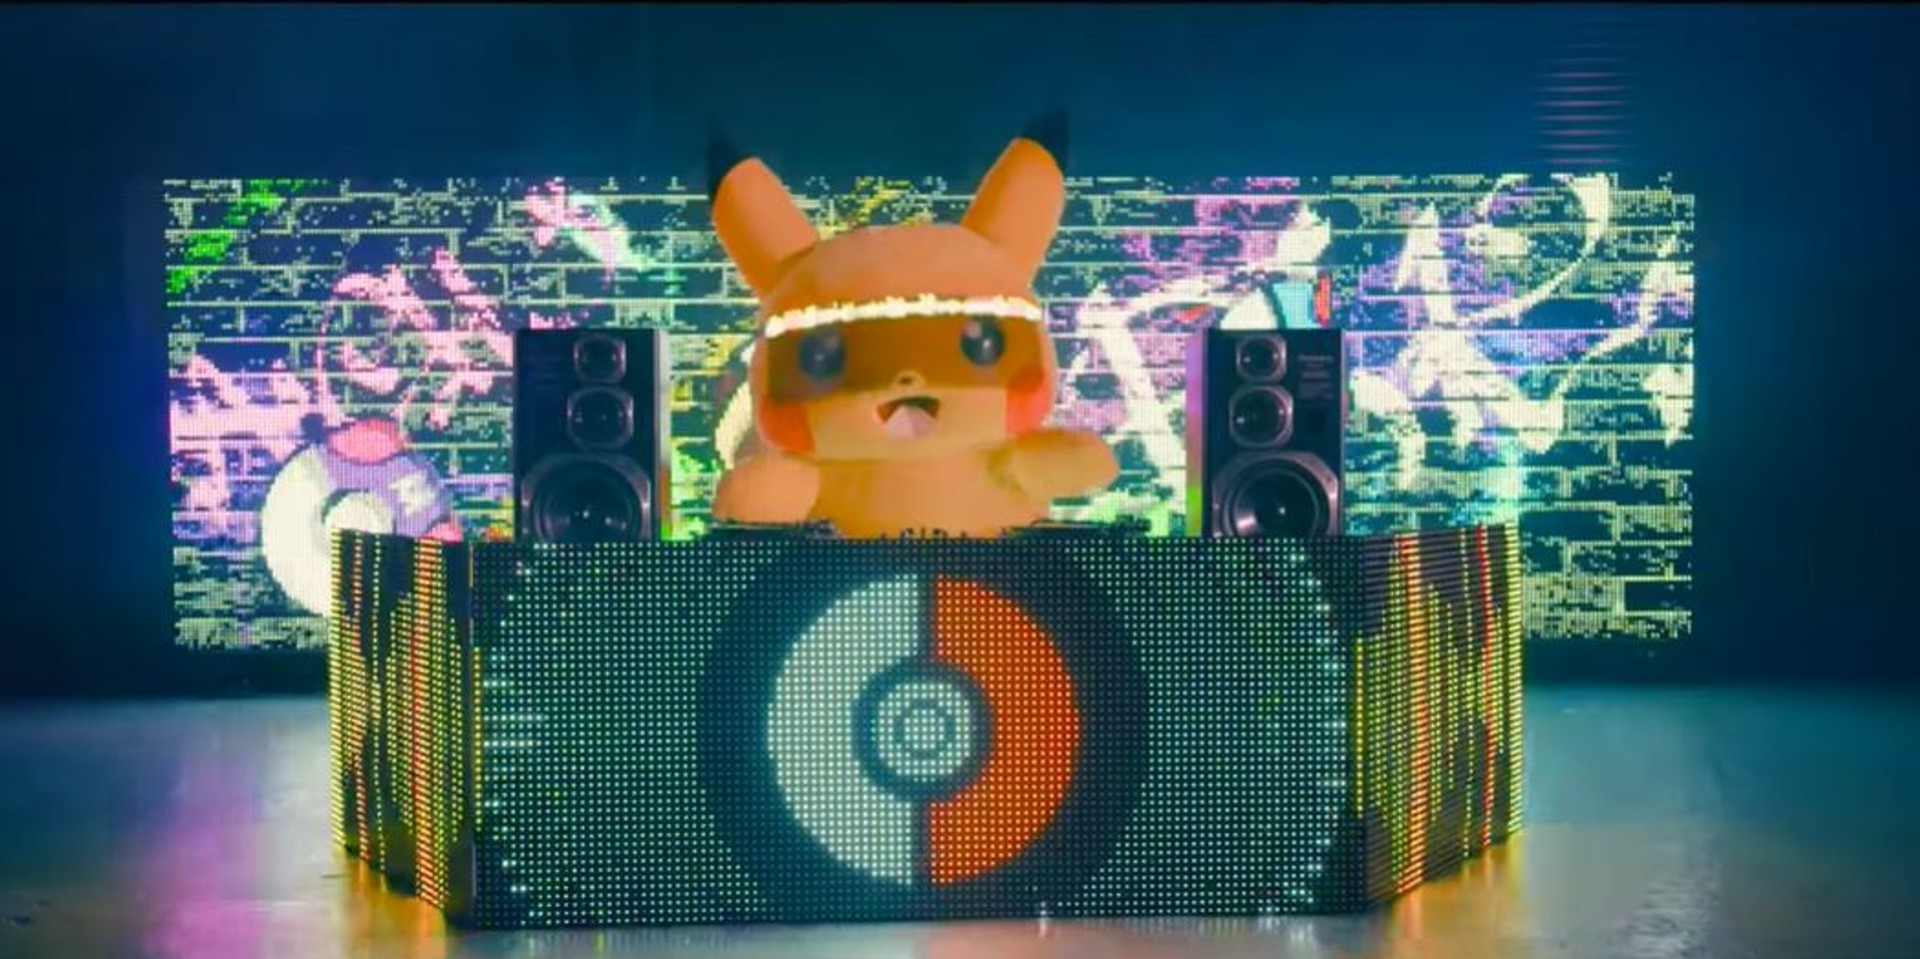 DJ Pikachu electrifies with 'Lightning Remix' and stunning light show – watch